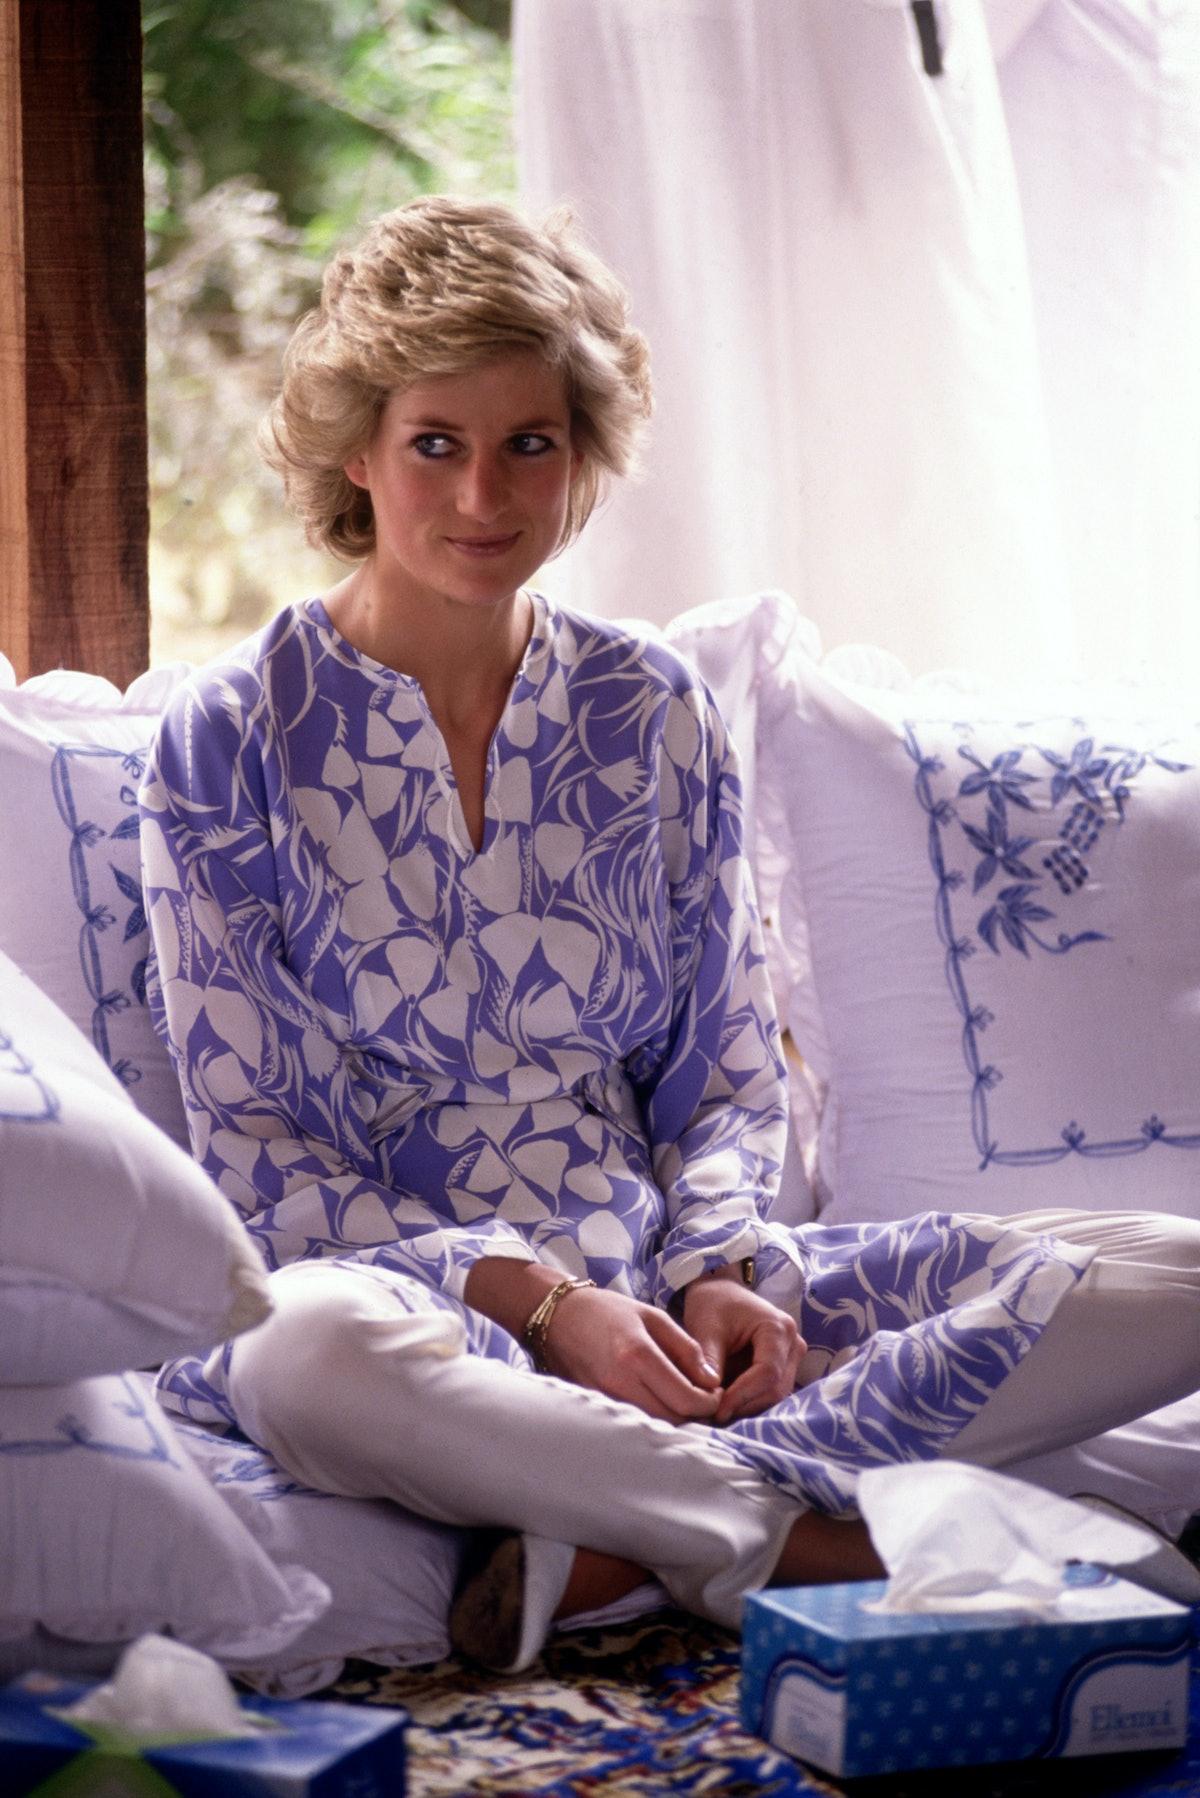 Princess Diana sitting cross-legged